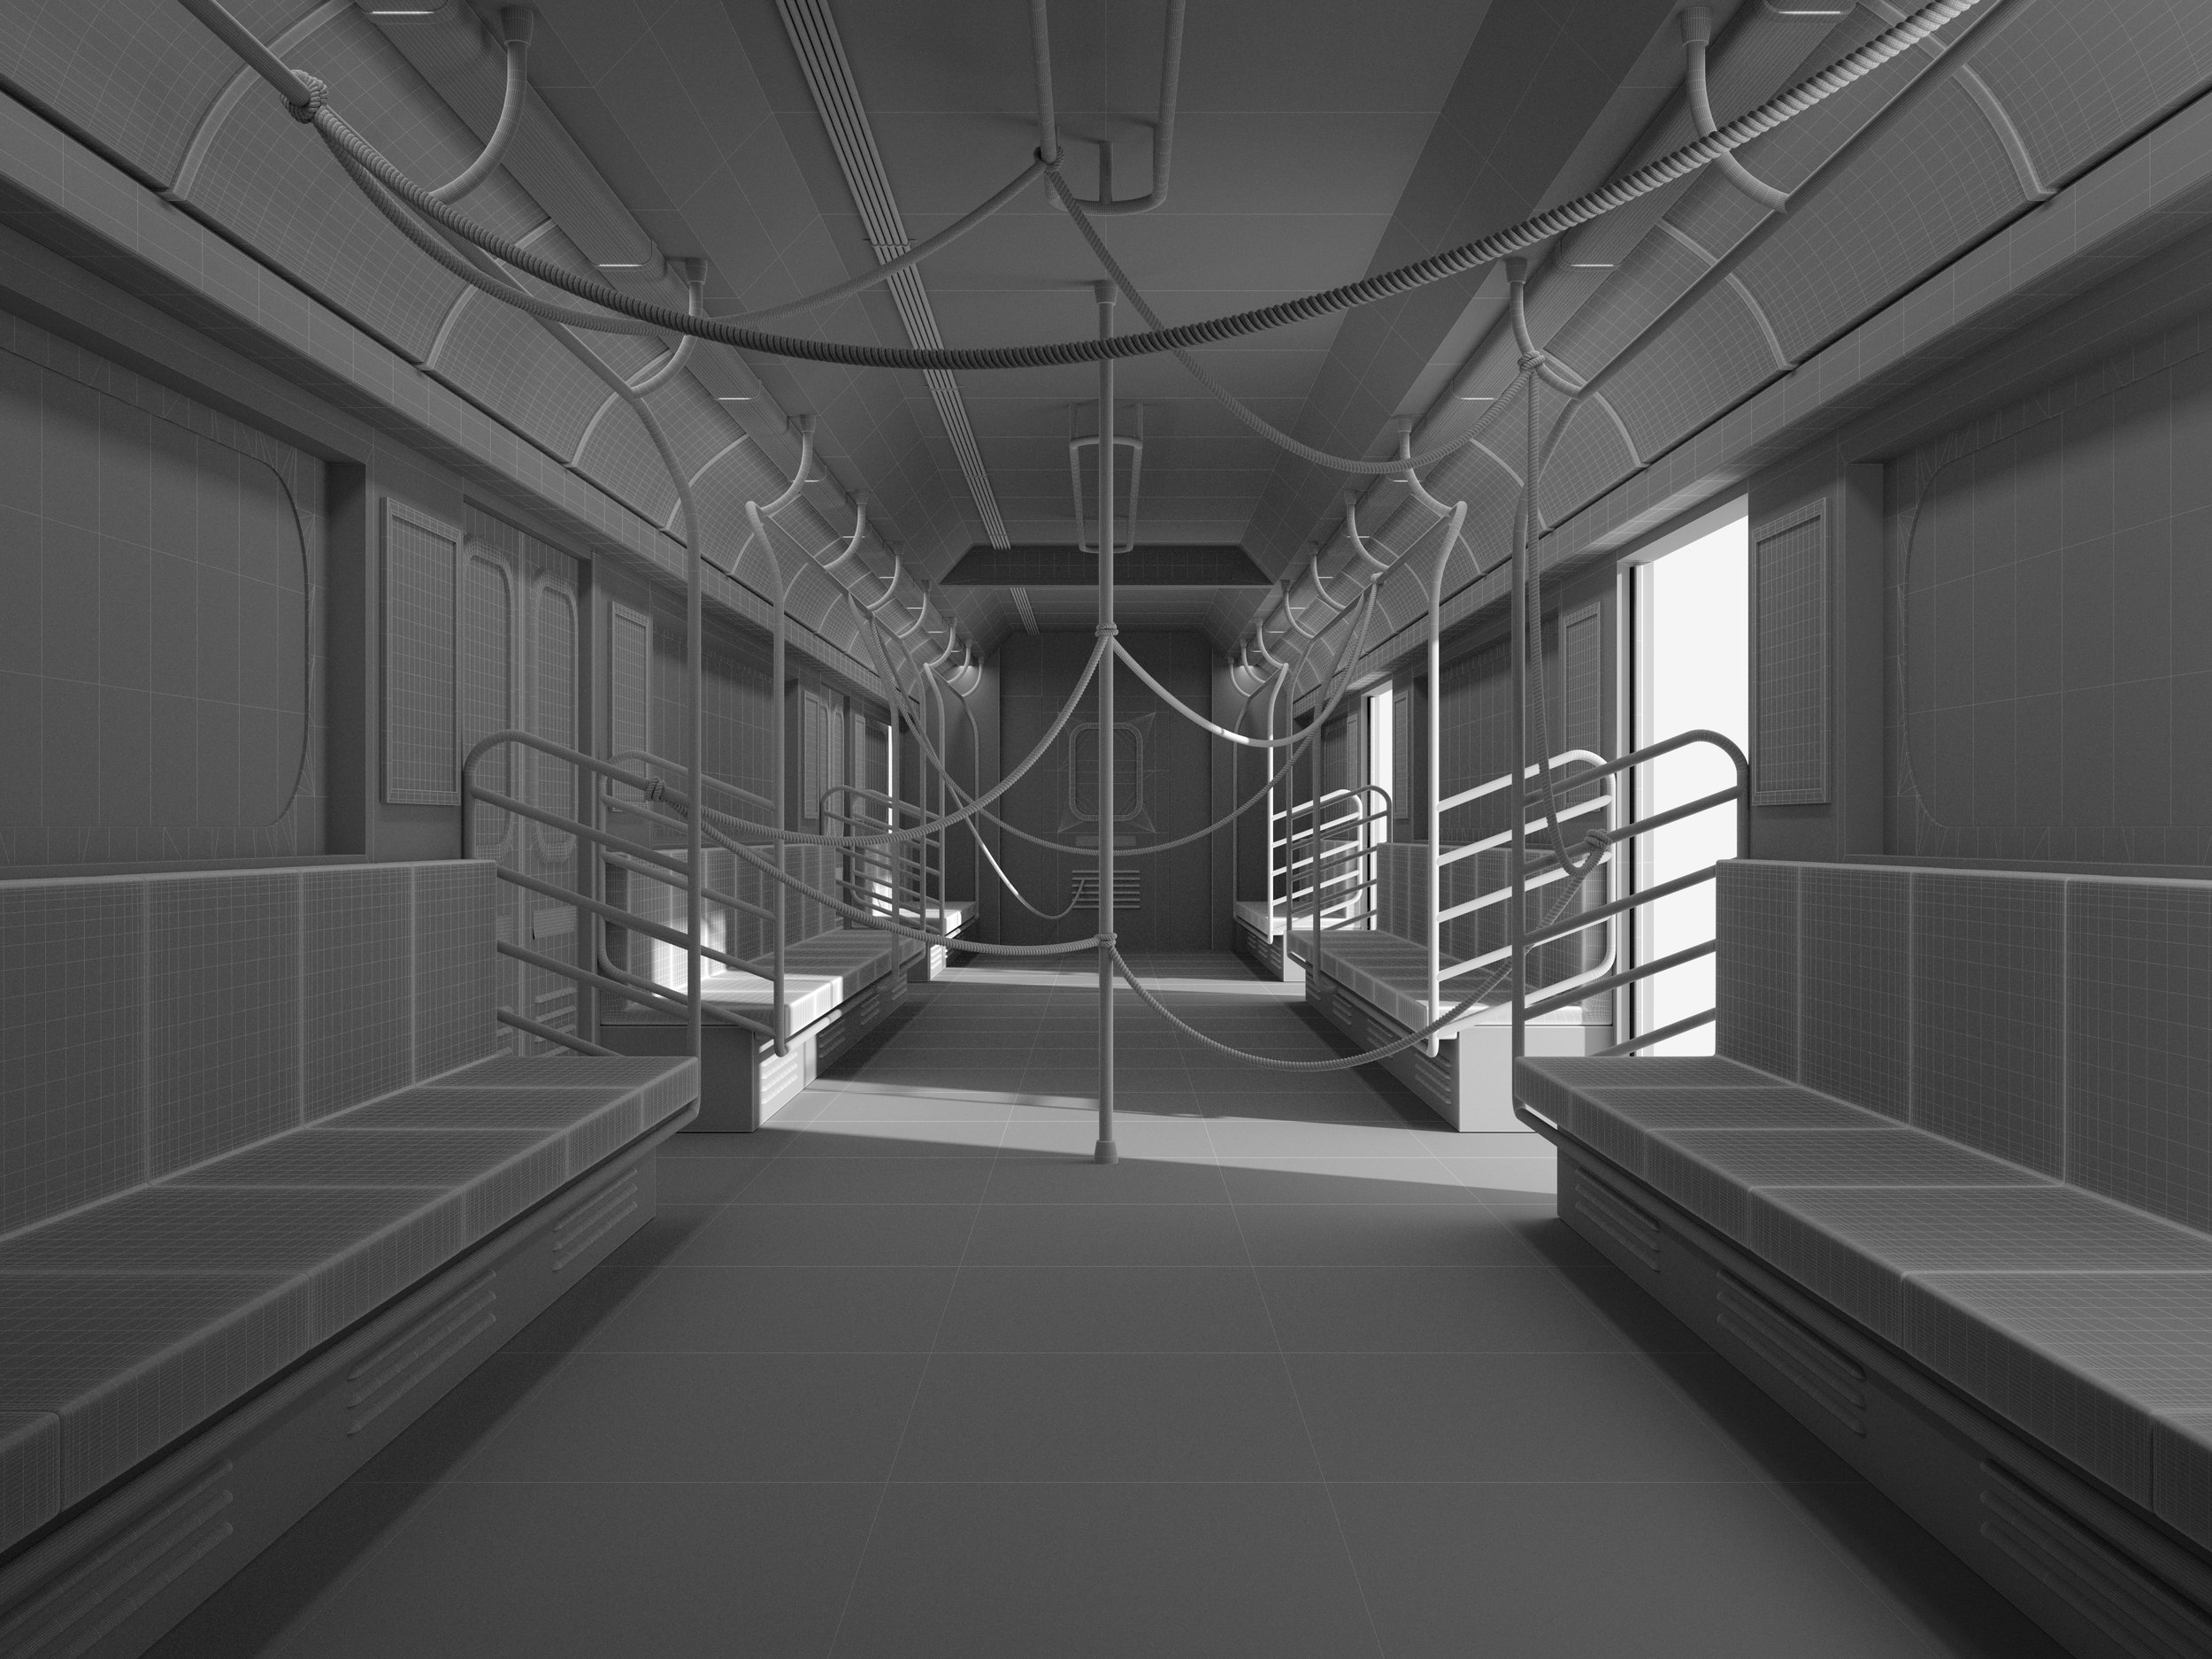 Train_A012_WF.jpg